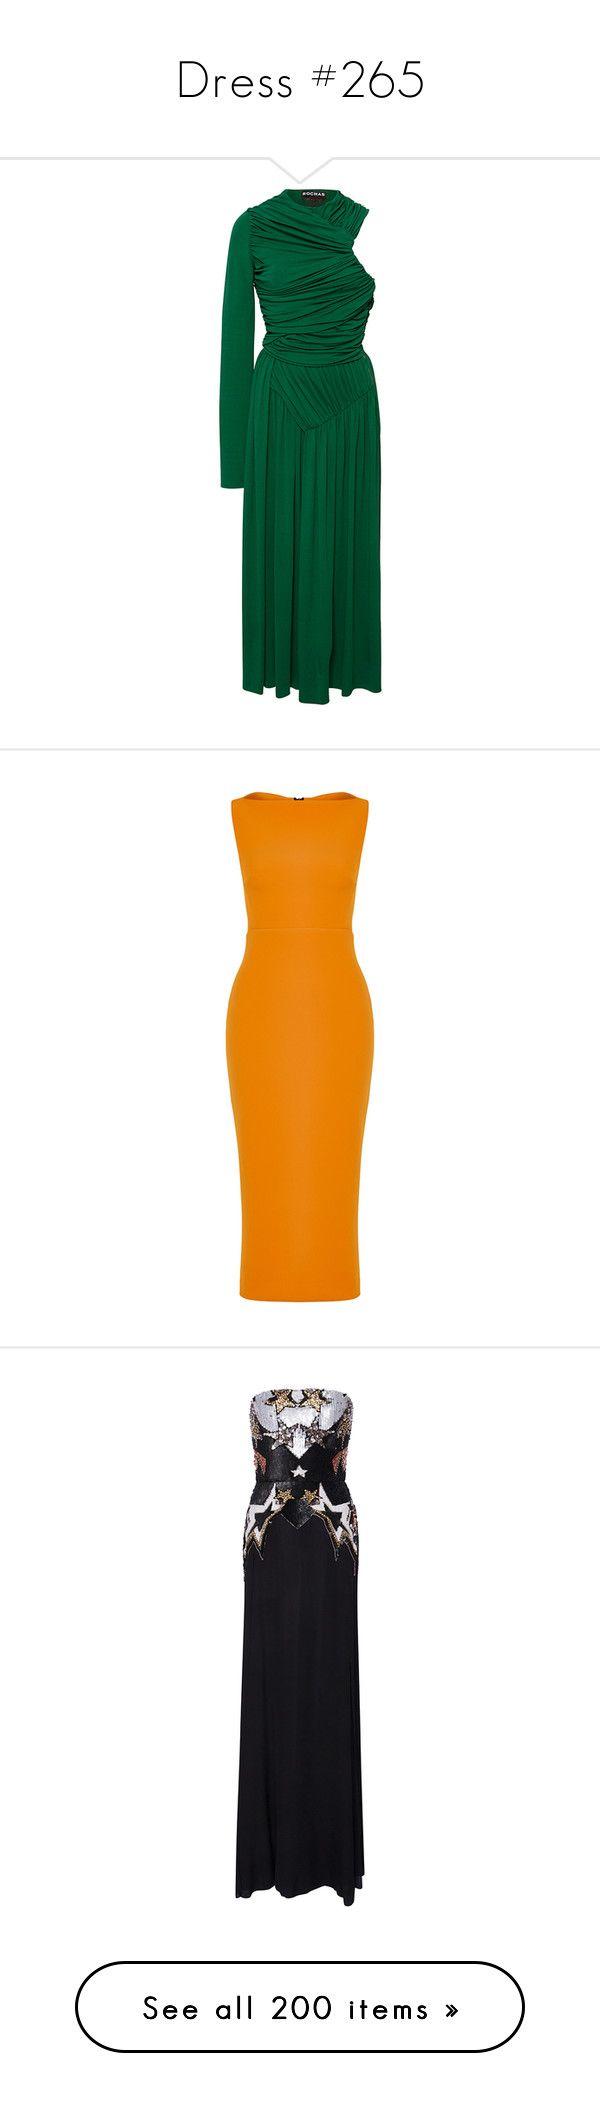 """Dress #265"" by bliznec-anna ❤ liked on Polyvore featuring dresses, green, one sleeve cocktail dress, green dress, long-sleeve midi dresses, pleated dress, drape dress, maticevski, orange and pencil dress"